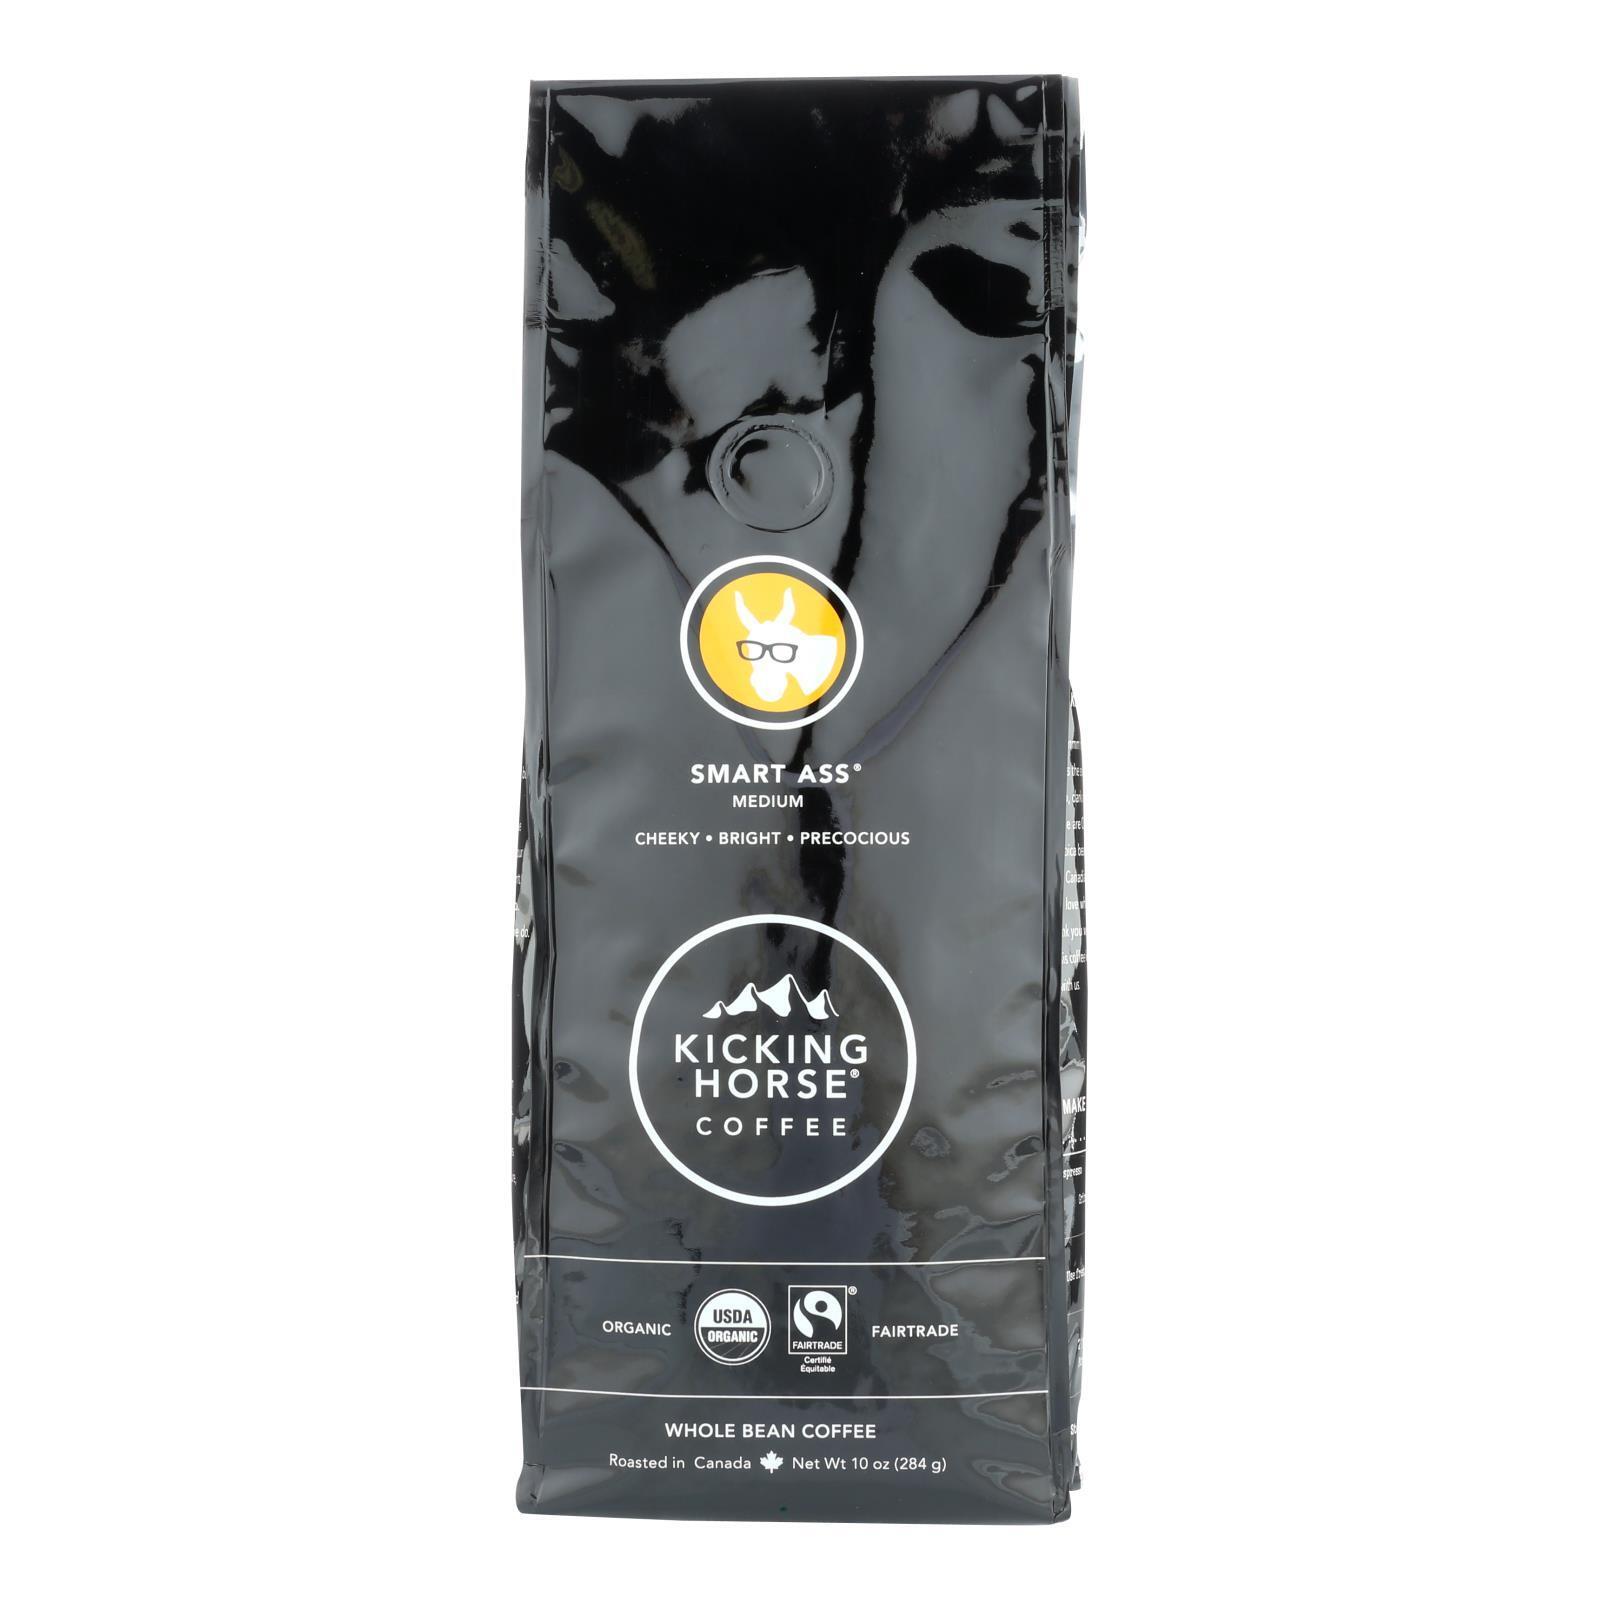 Kicking Horse Coffee - Whole Bean - Smart Ass - Case of 6 - 10 oz.